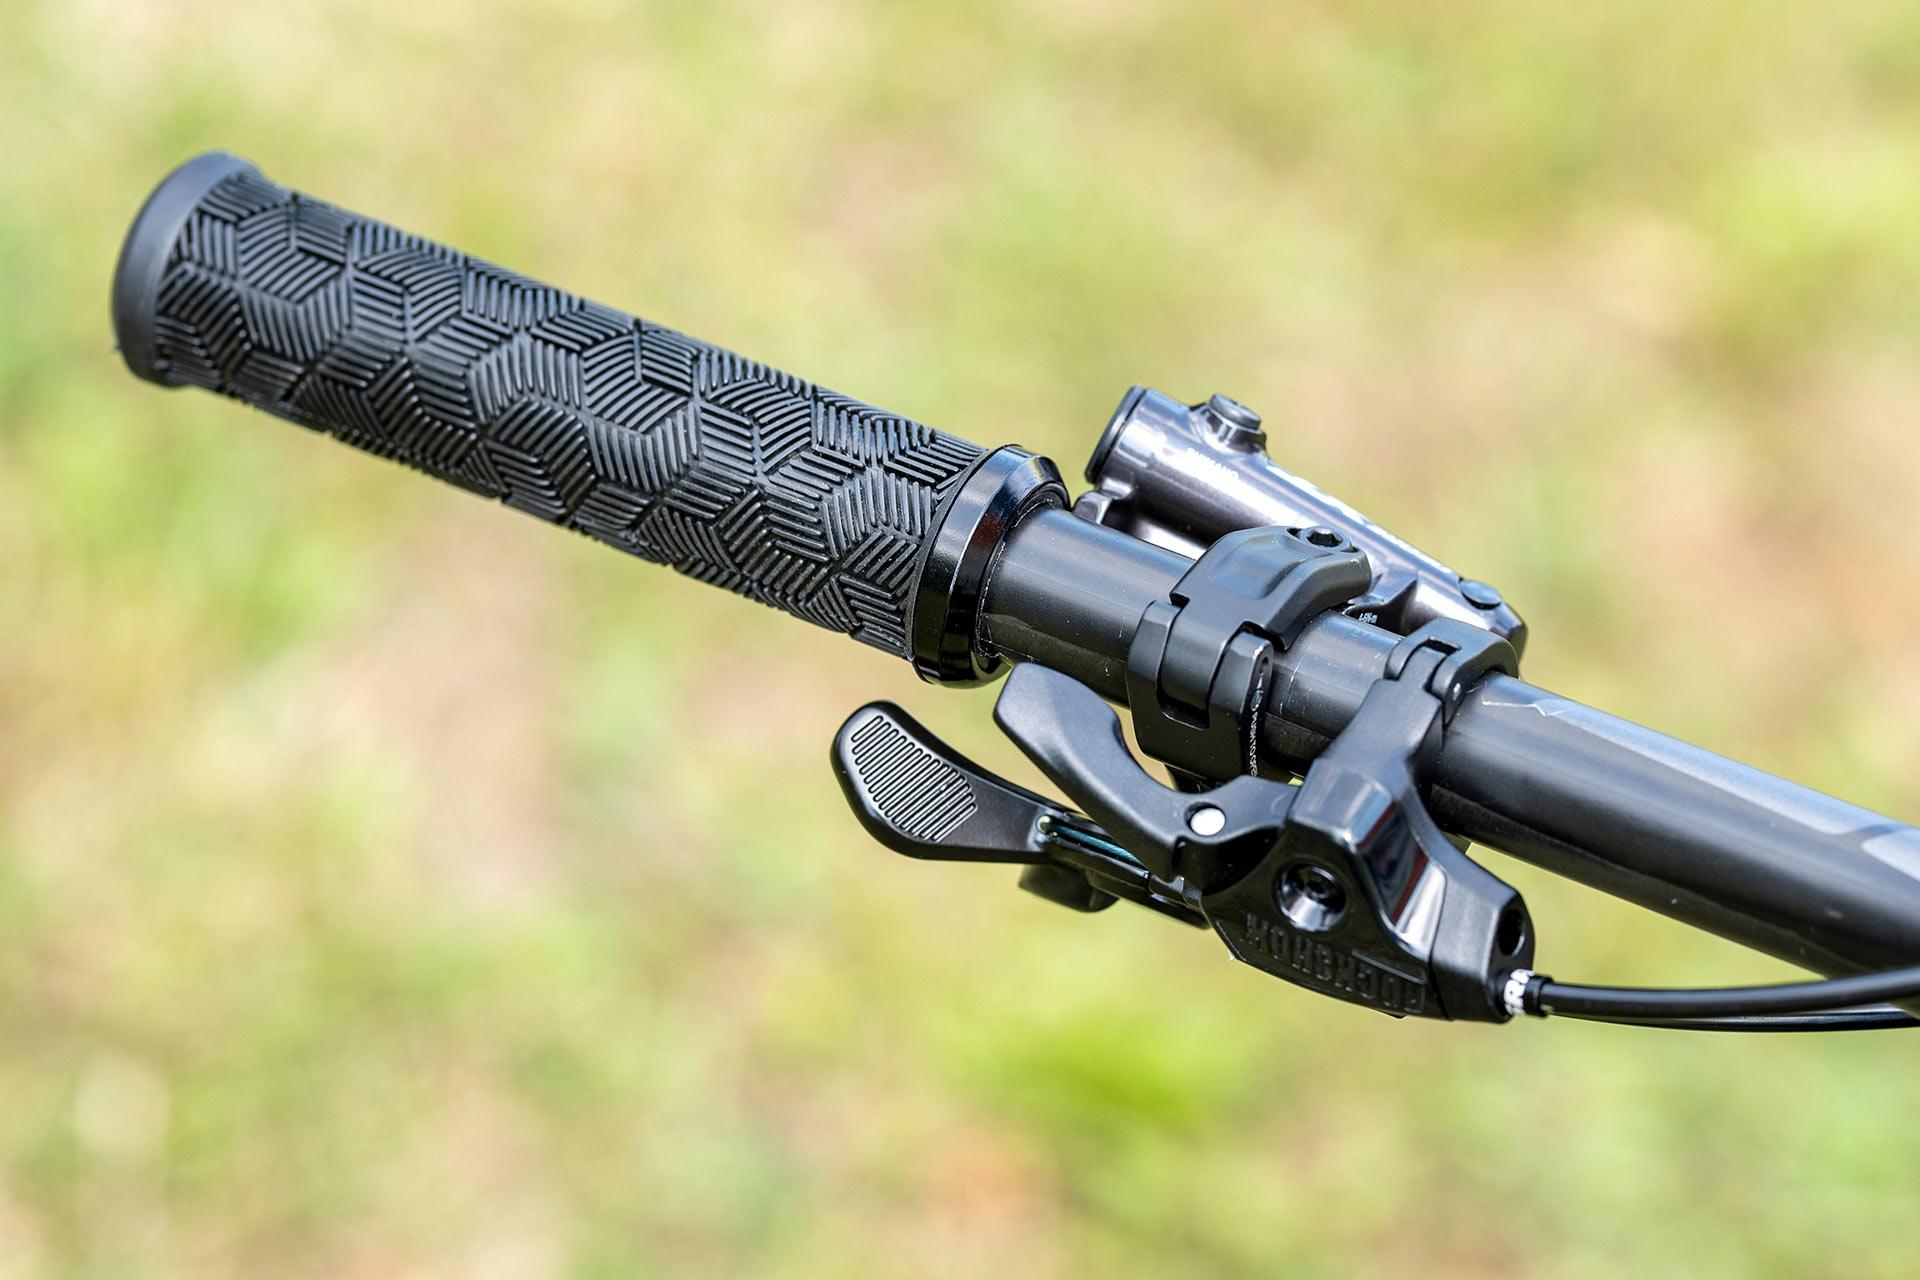 Giant XTC Advanced SL 29 1